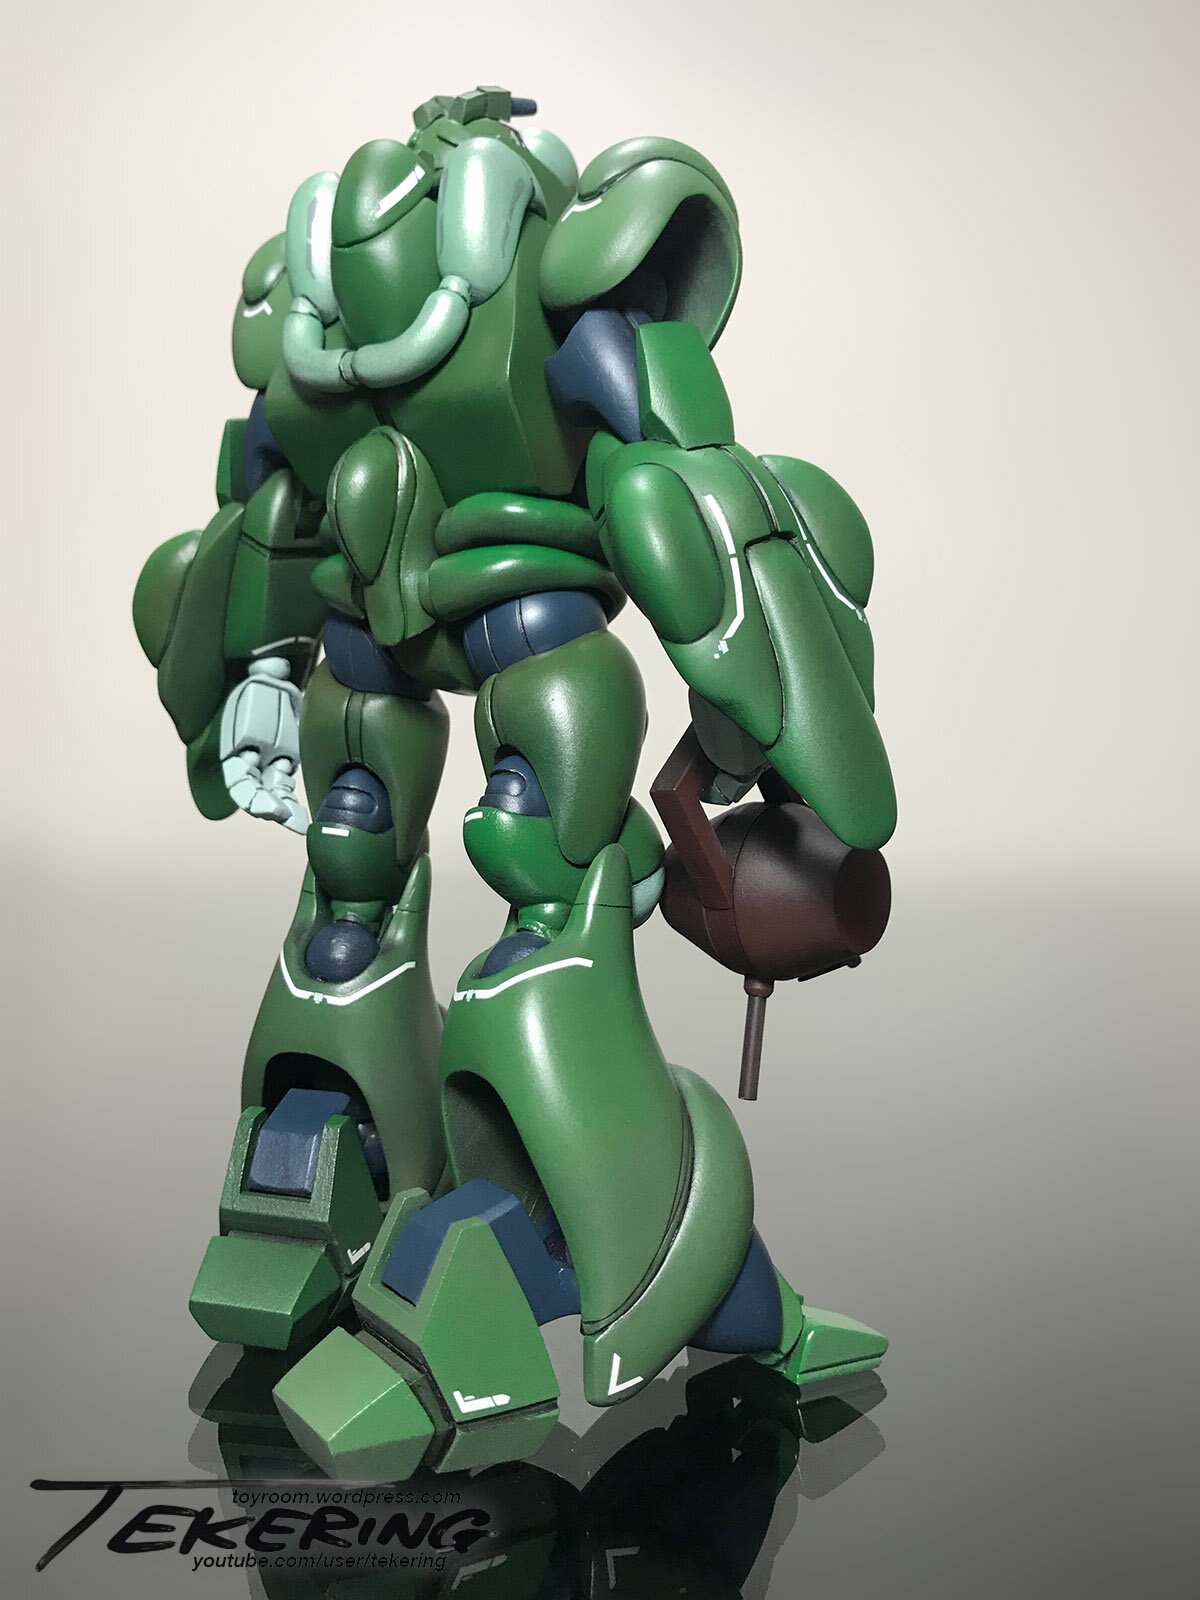 Bioroid-Subcommander-Green-back.jpg.1e5f85ec38a4582fa8e5b4ca6475fb50.jpg